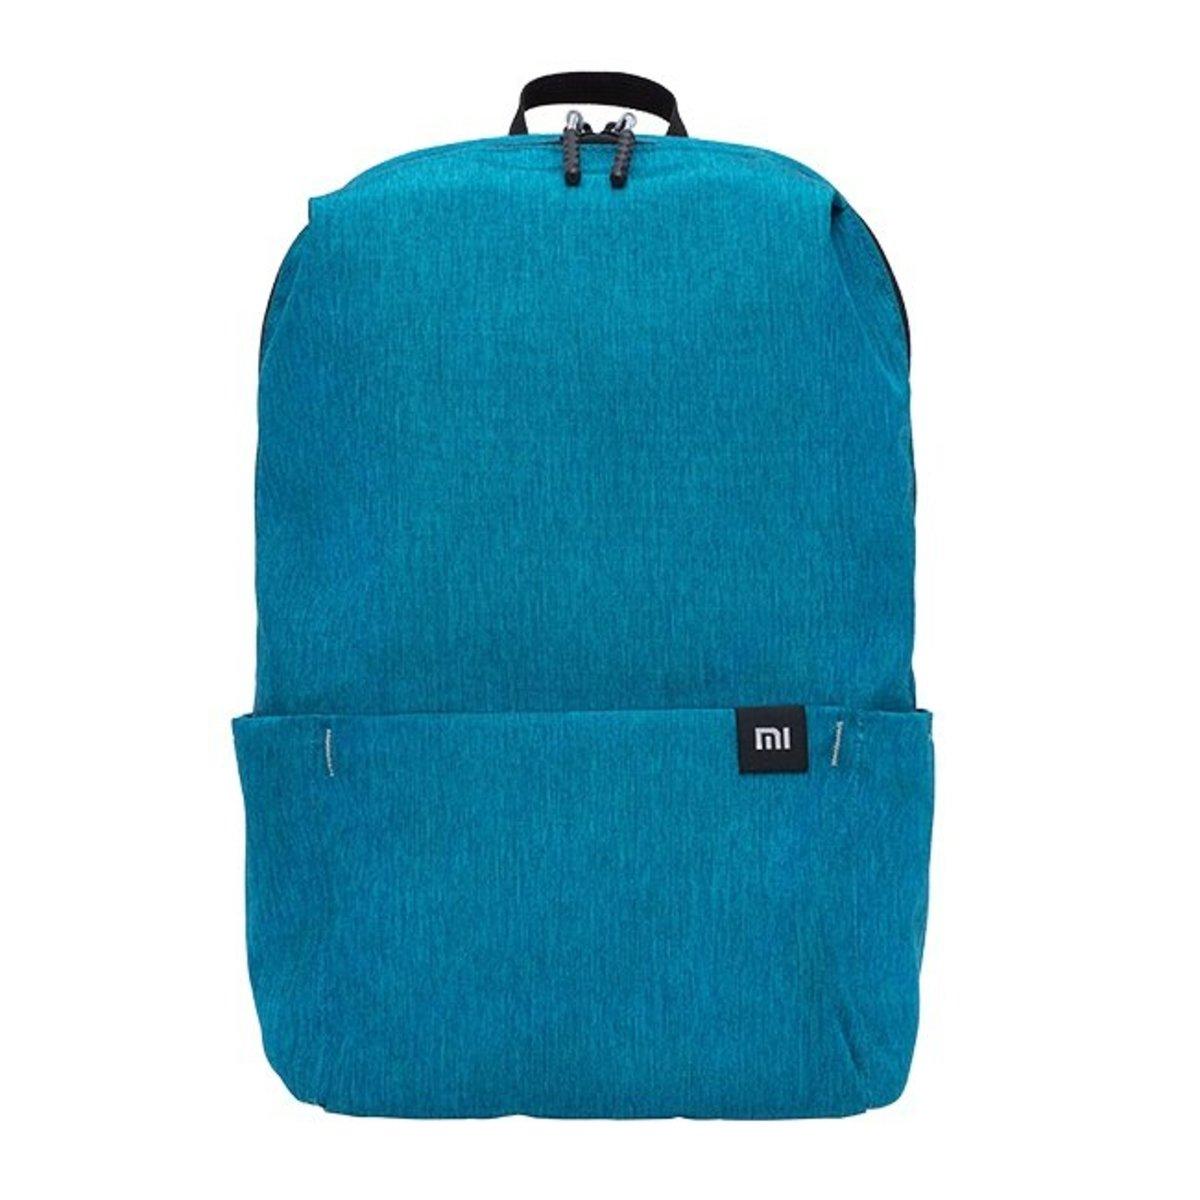 Water Resistant 10L Backpack Light Blue